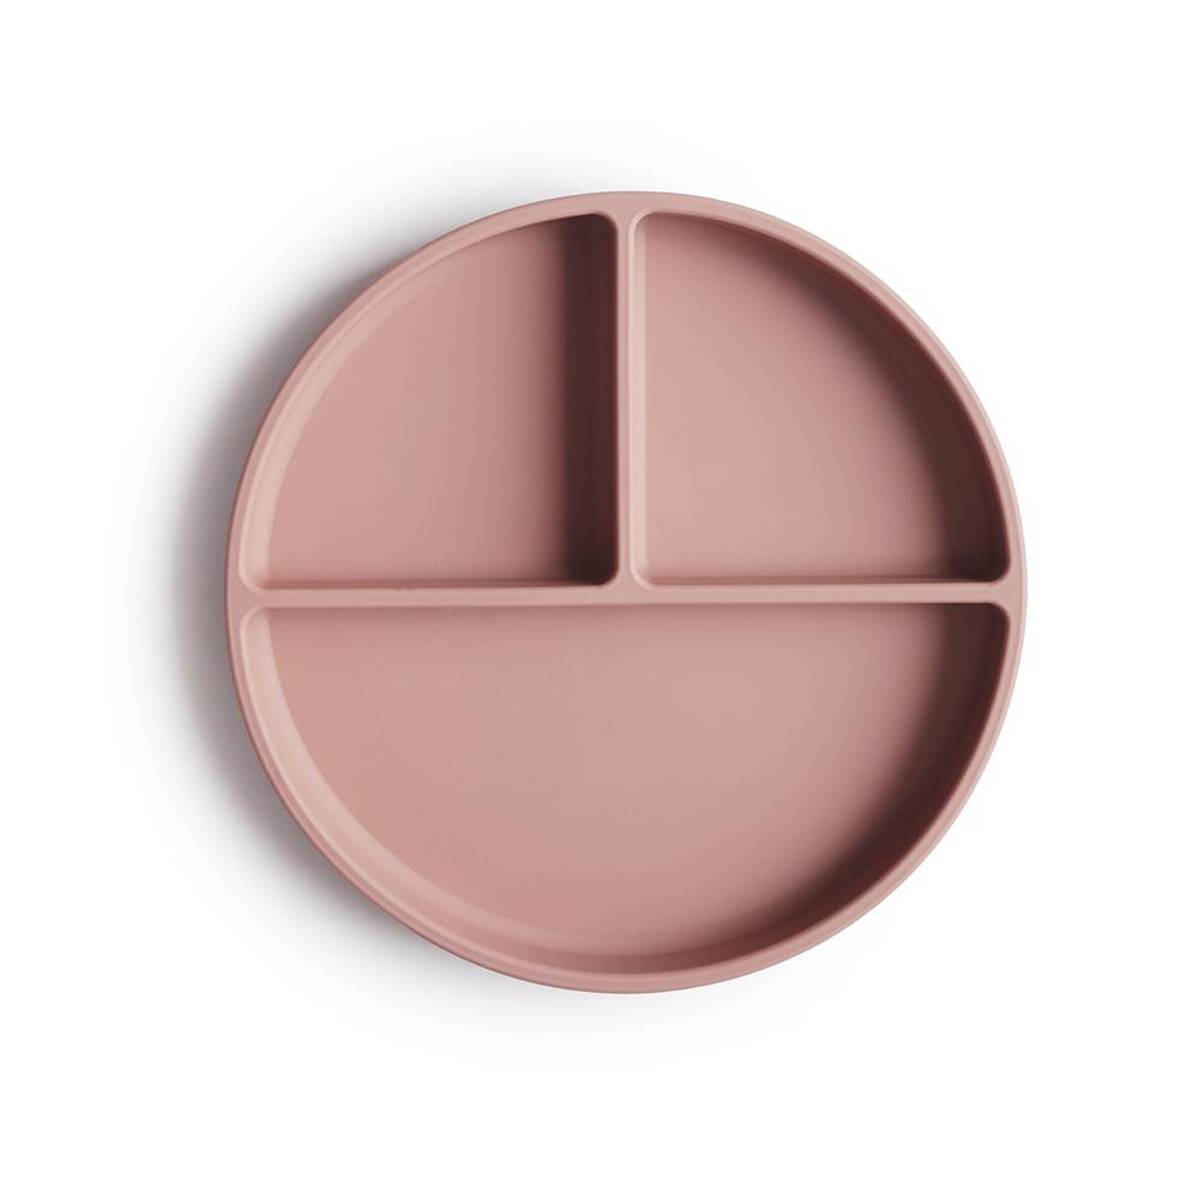 Tallerken - Silikon med Sugefunksjon - Mushie - Blush